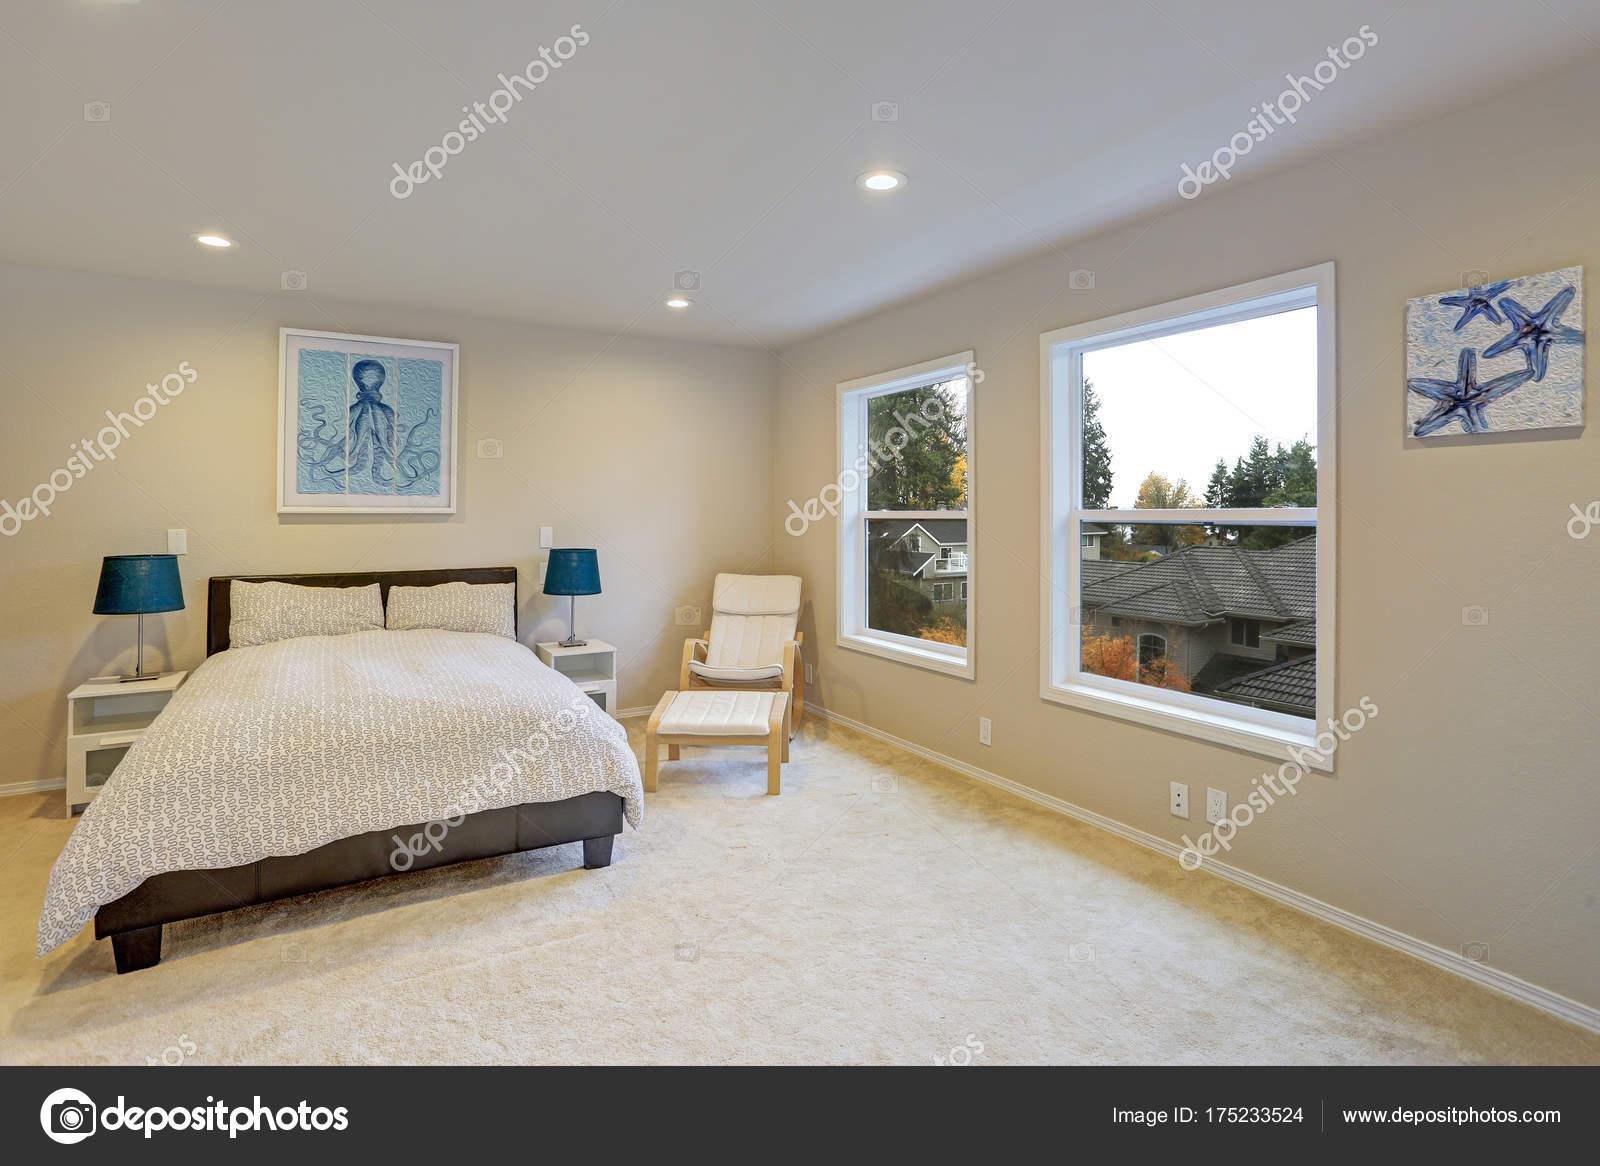 Kleur Slaapkamer Muur : Zwart leder bed voor slaapkamer met crème muur interieur kleur